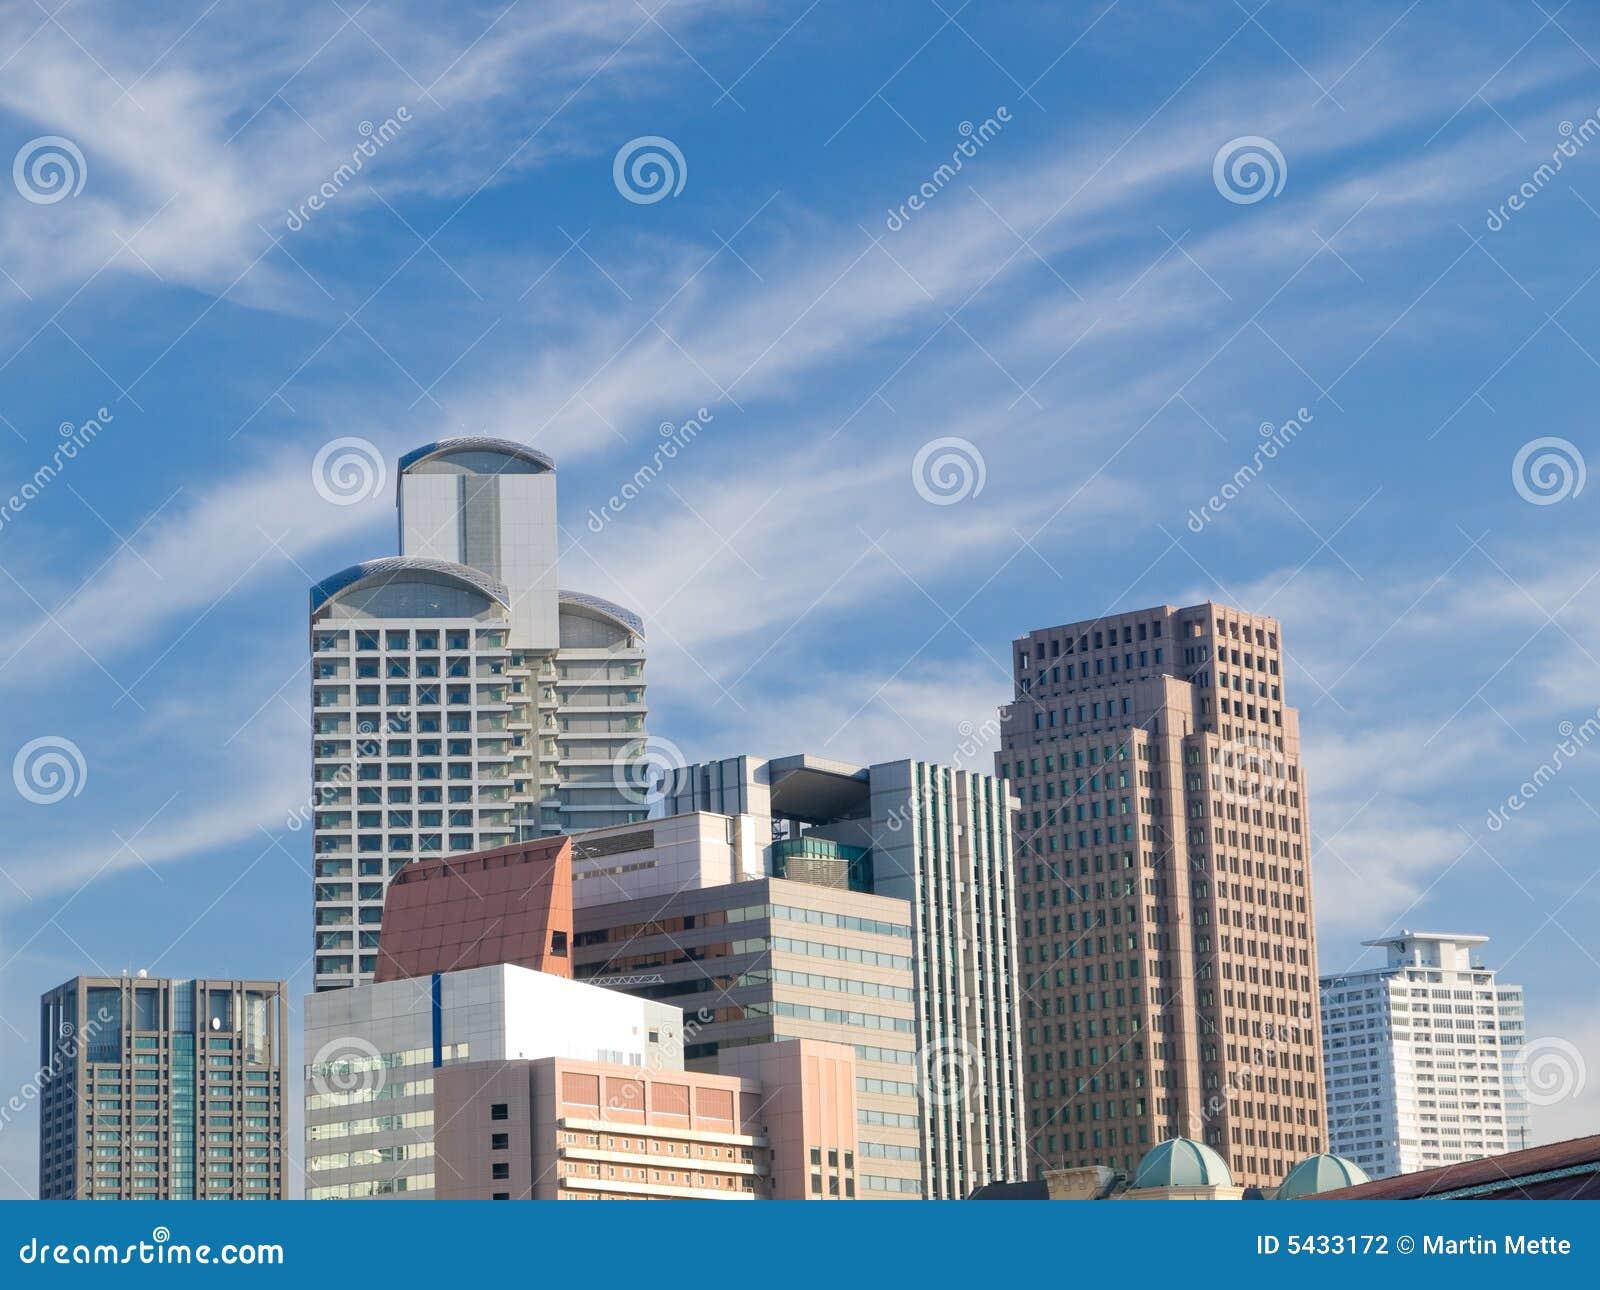 Urban city scene